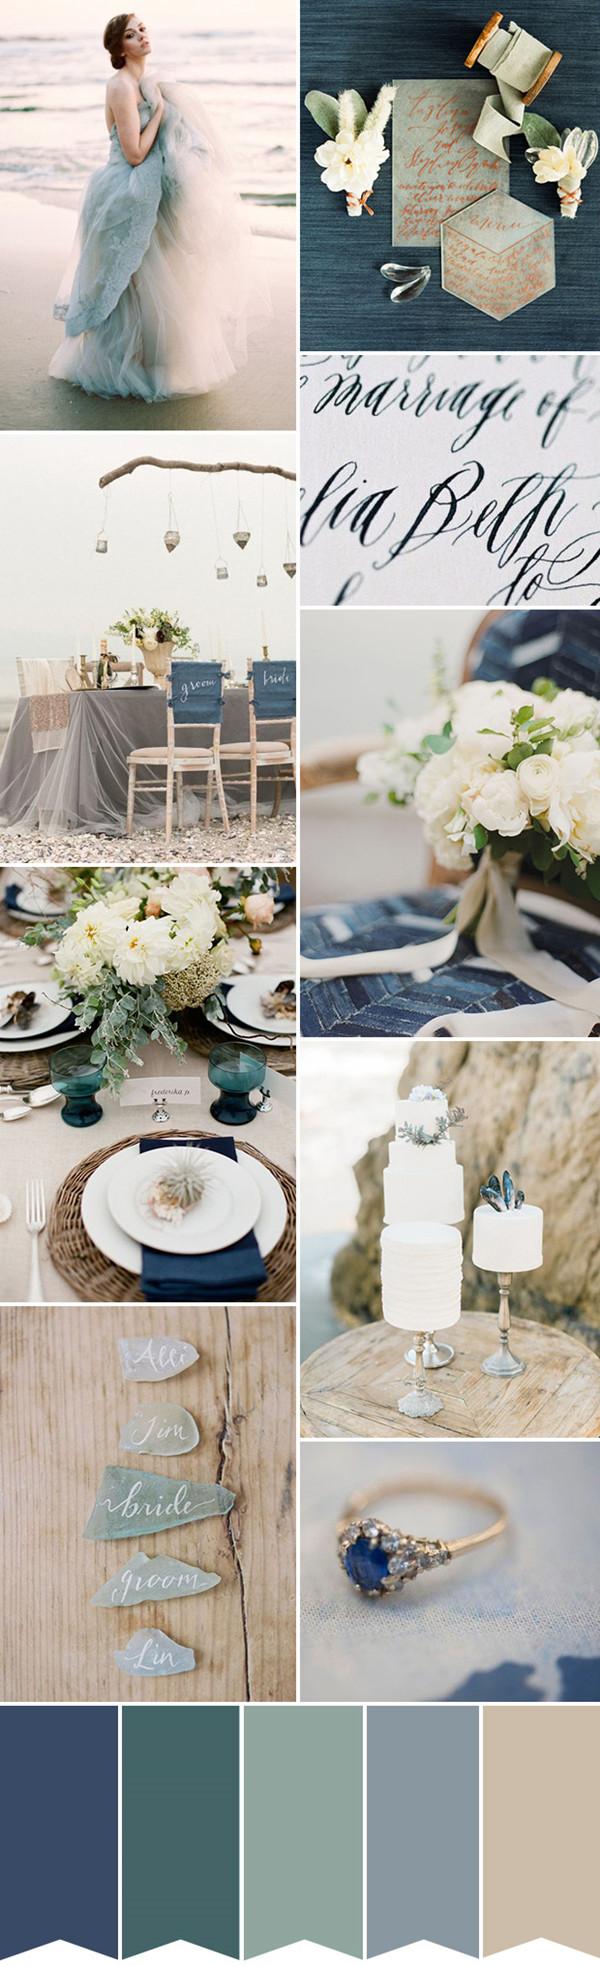 seaside-blues-and-greens-2016-trending-wedding-color-palette.jpg